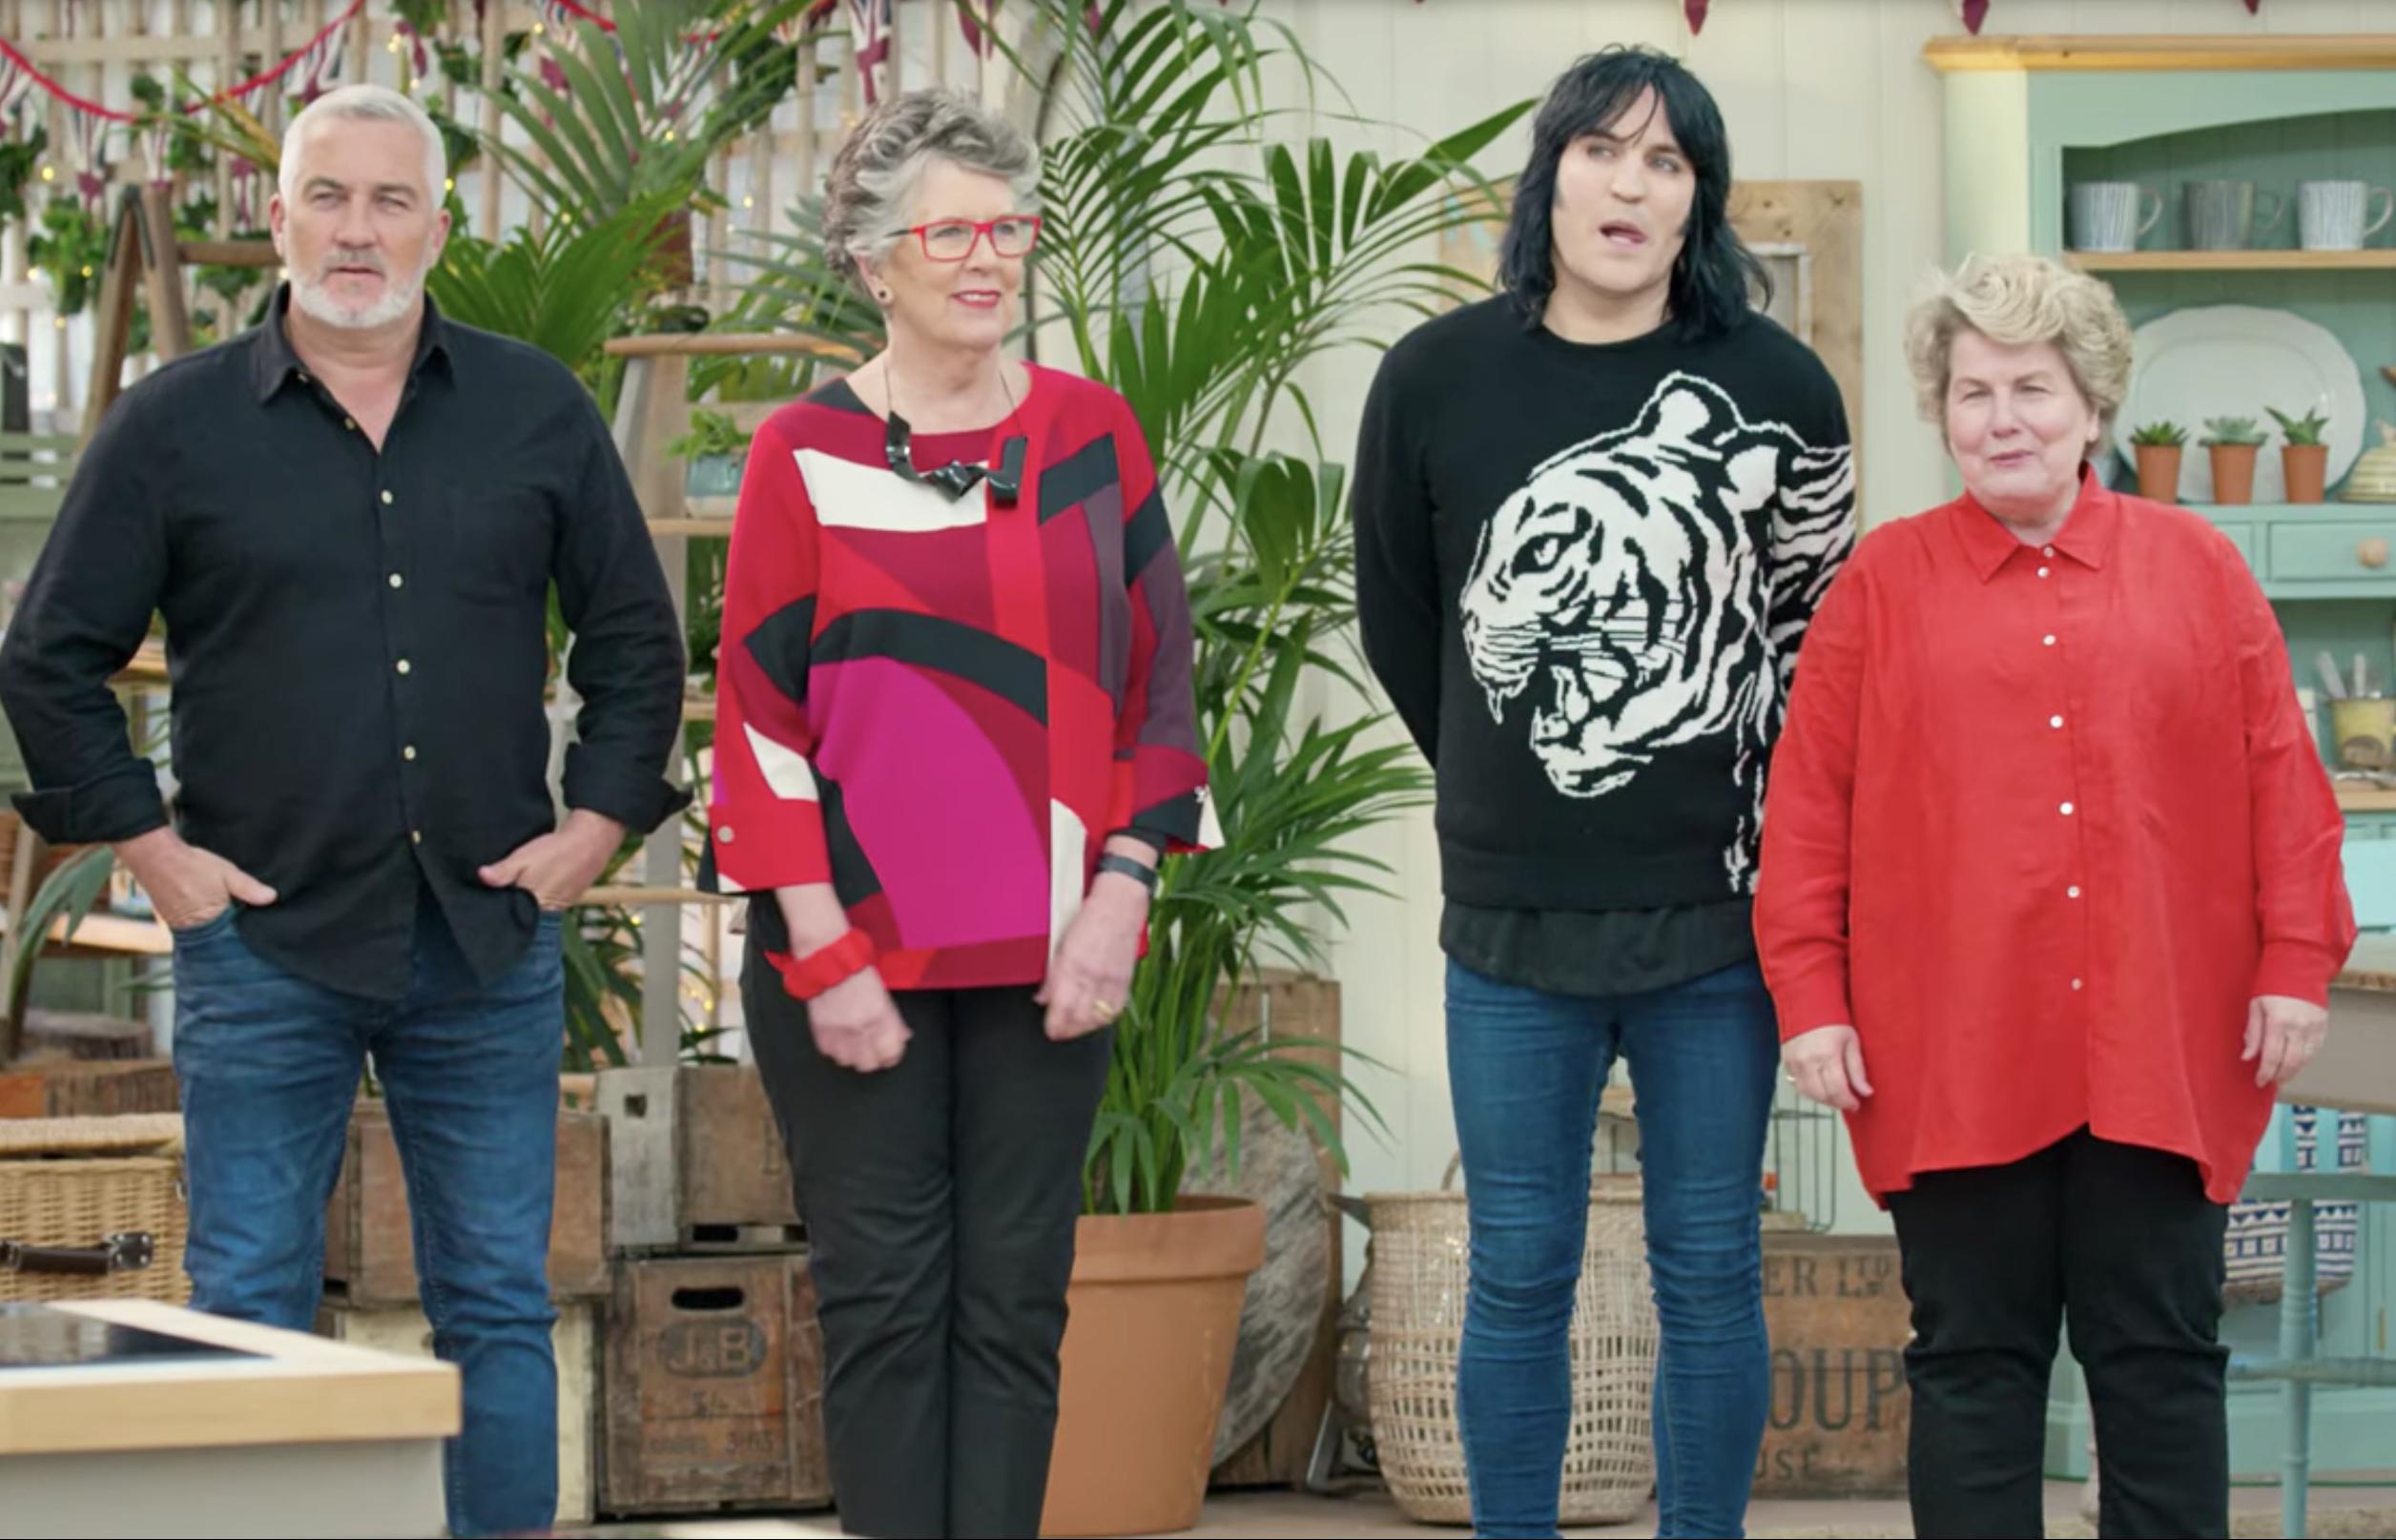 Great British Baking Show hosts Paul Hollywood, Prue Leith, Noel Fielding, and Sandi Toksvig.